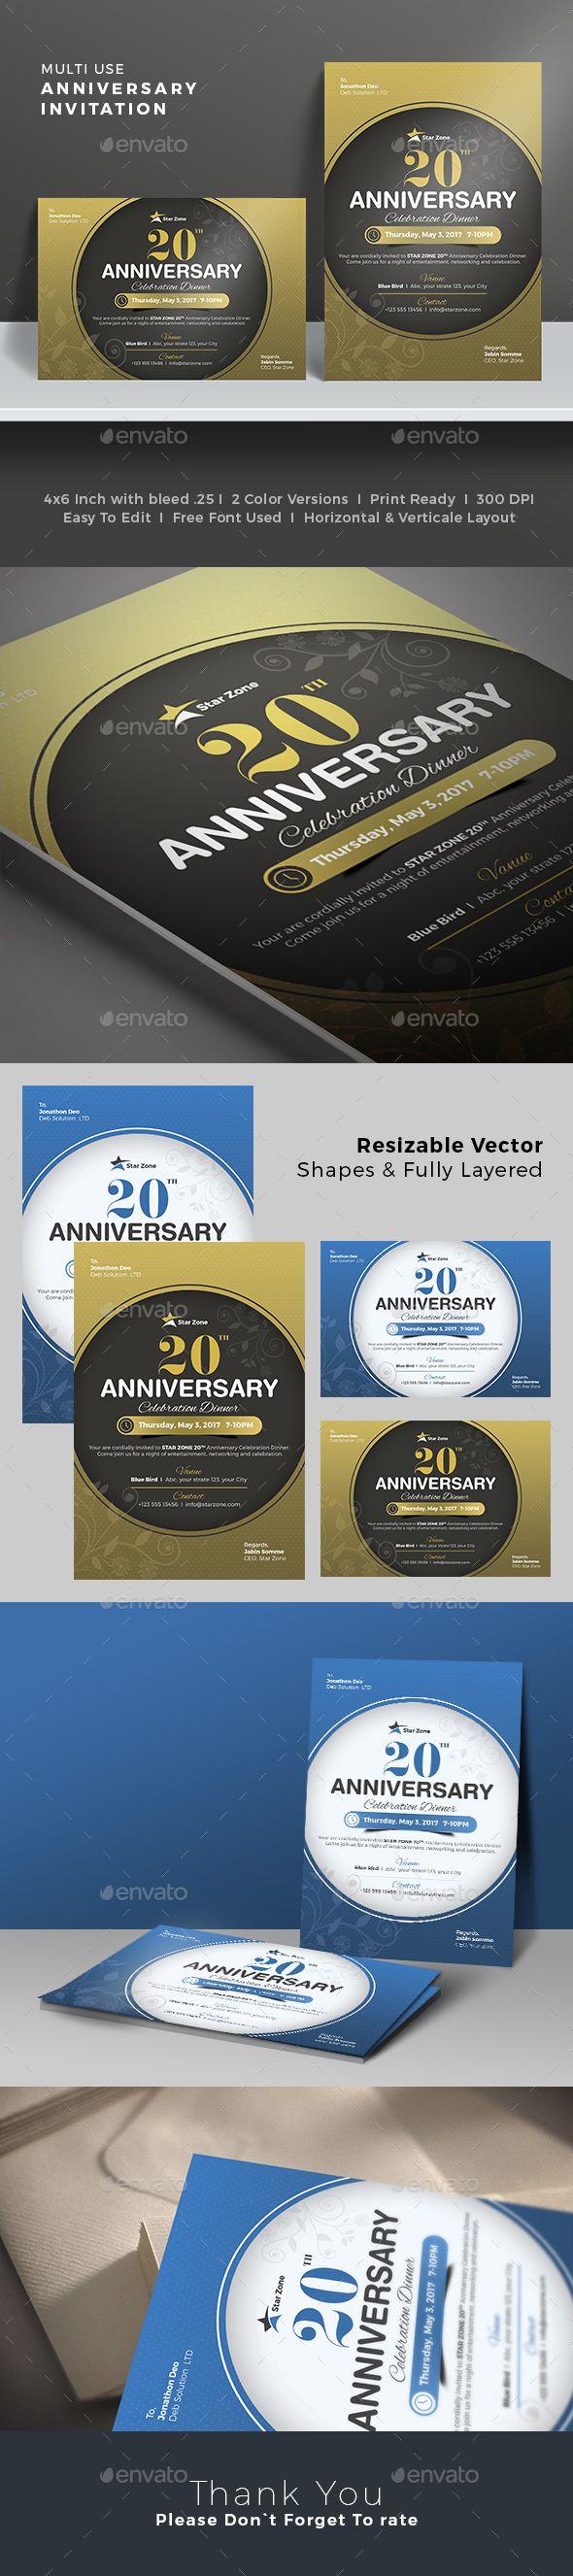 Anniversary Invitation Card Anniversary Invitations Template And - Small invitation cards templates